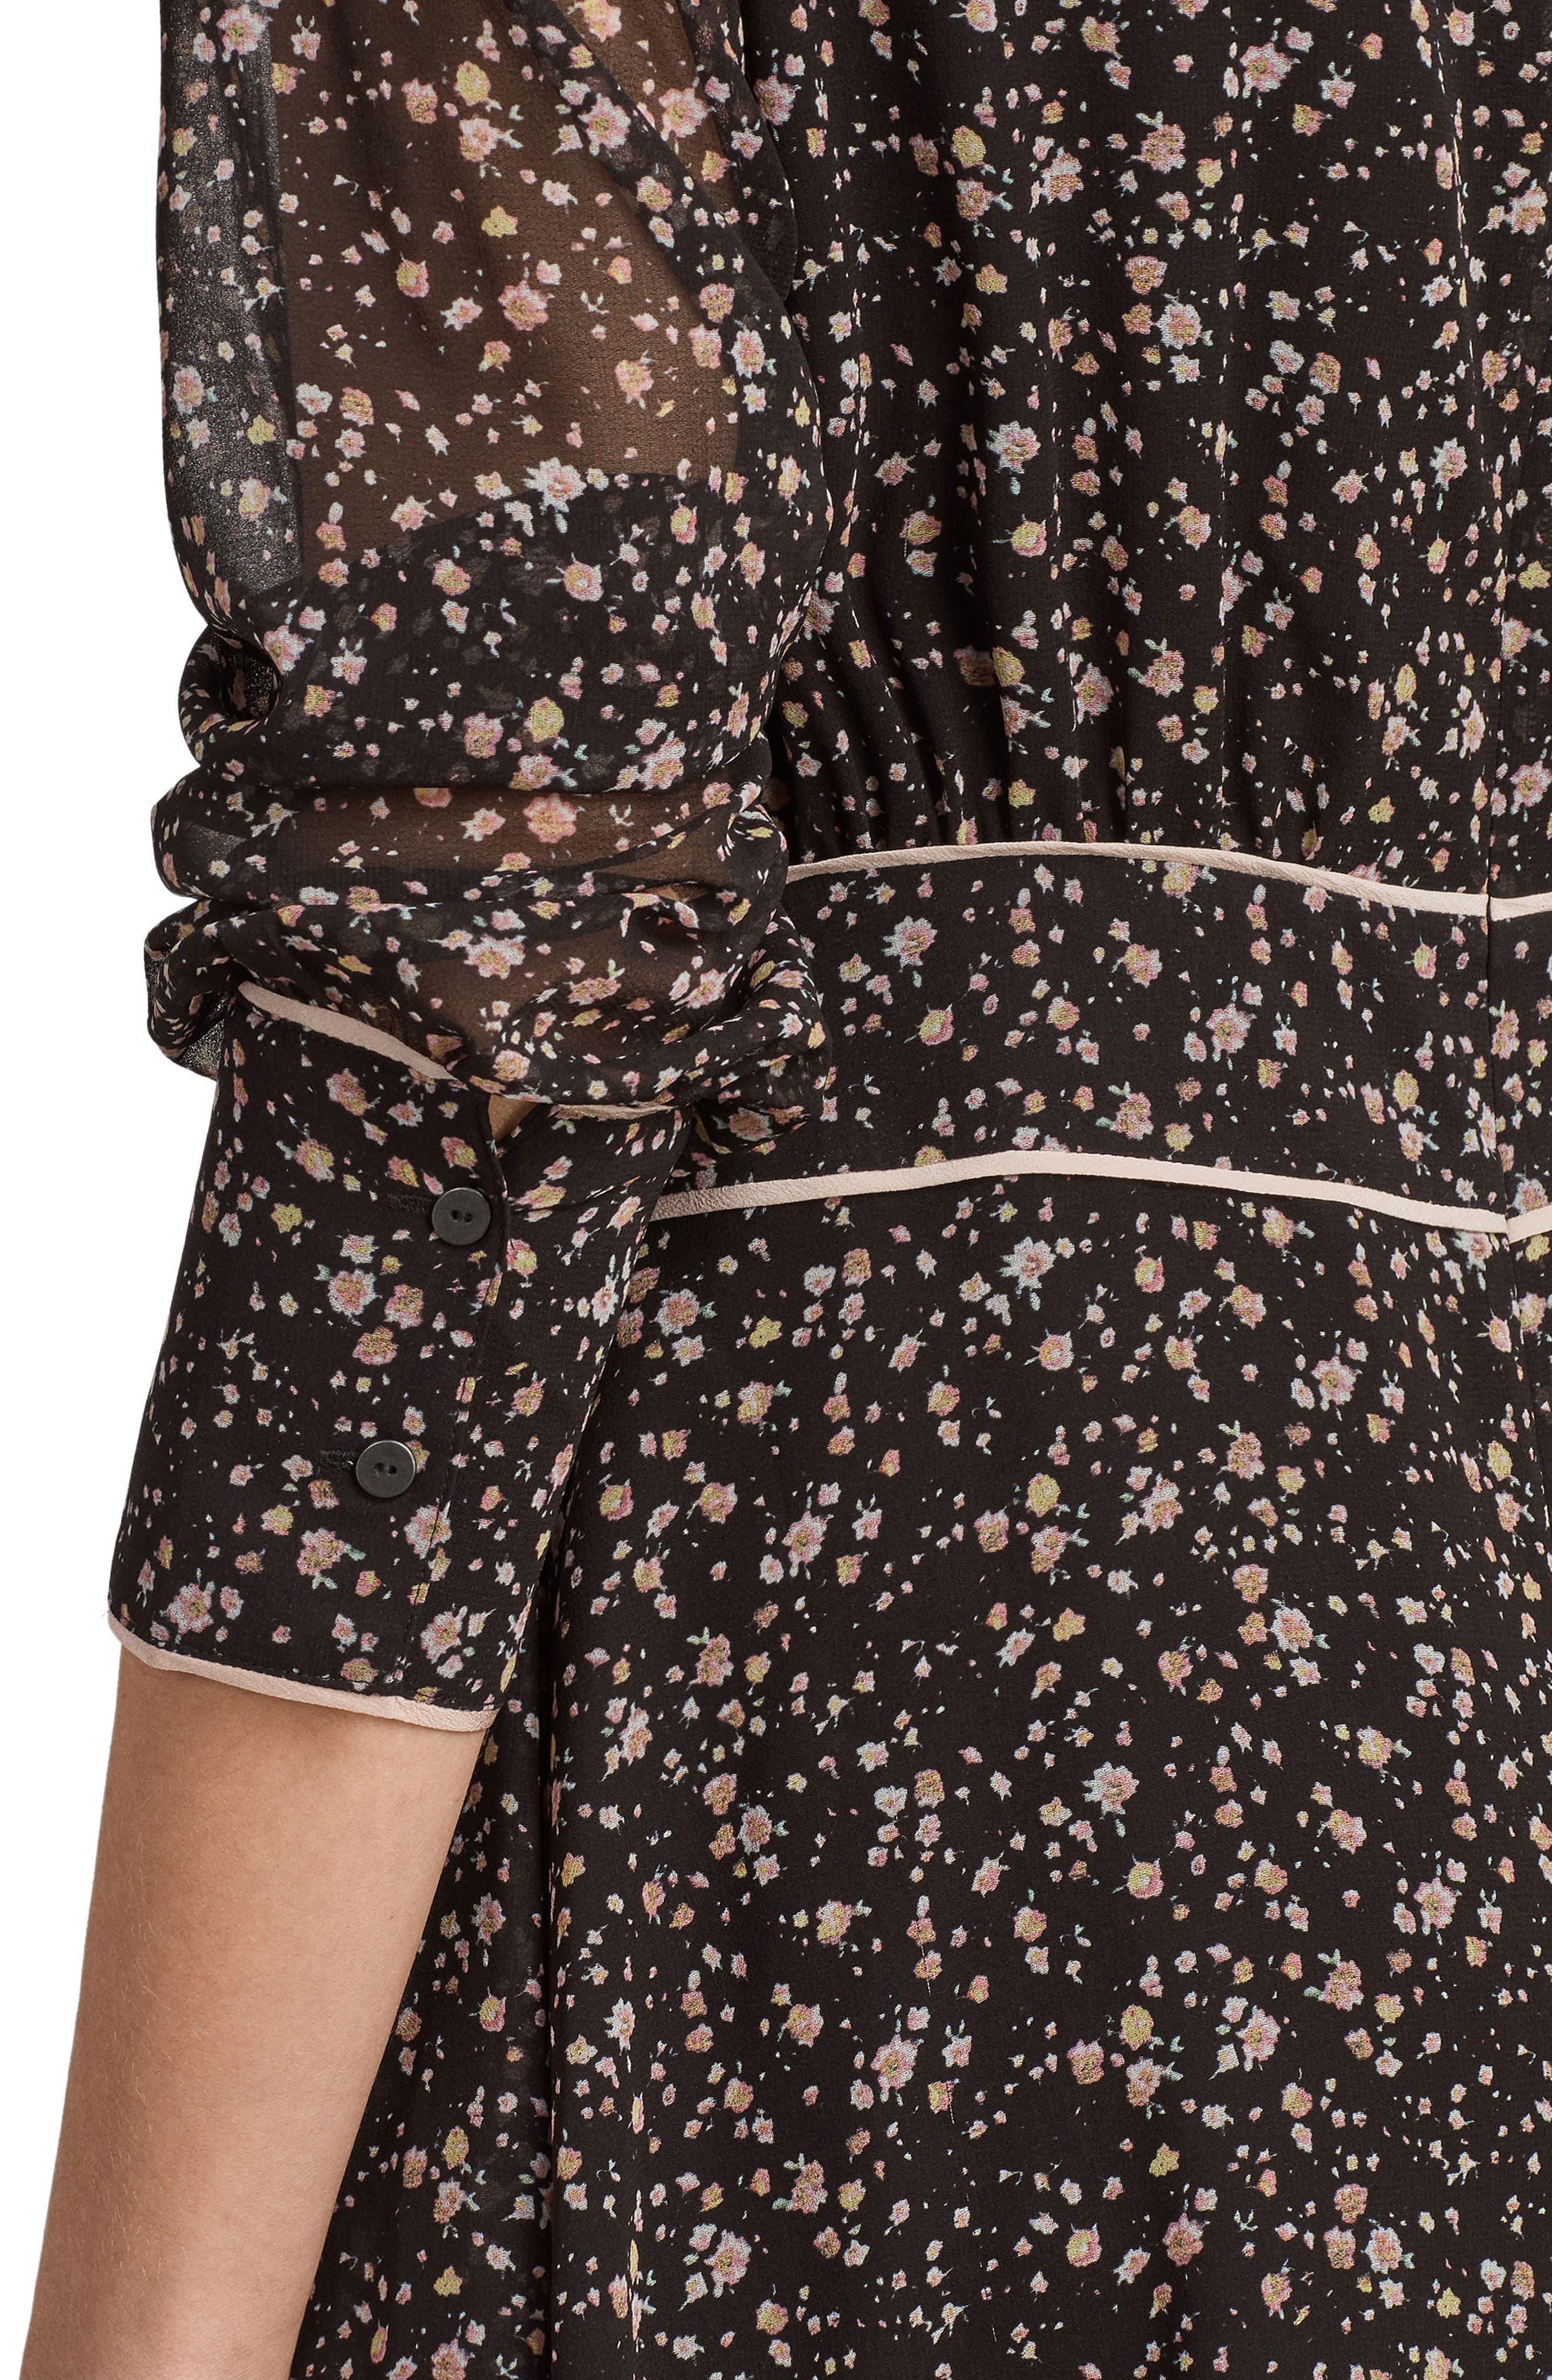 Kay Pepper Floral Print Dress,                             Alternate thumbnail 6, color,                             001